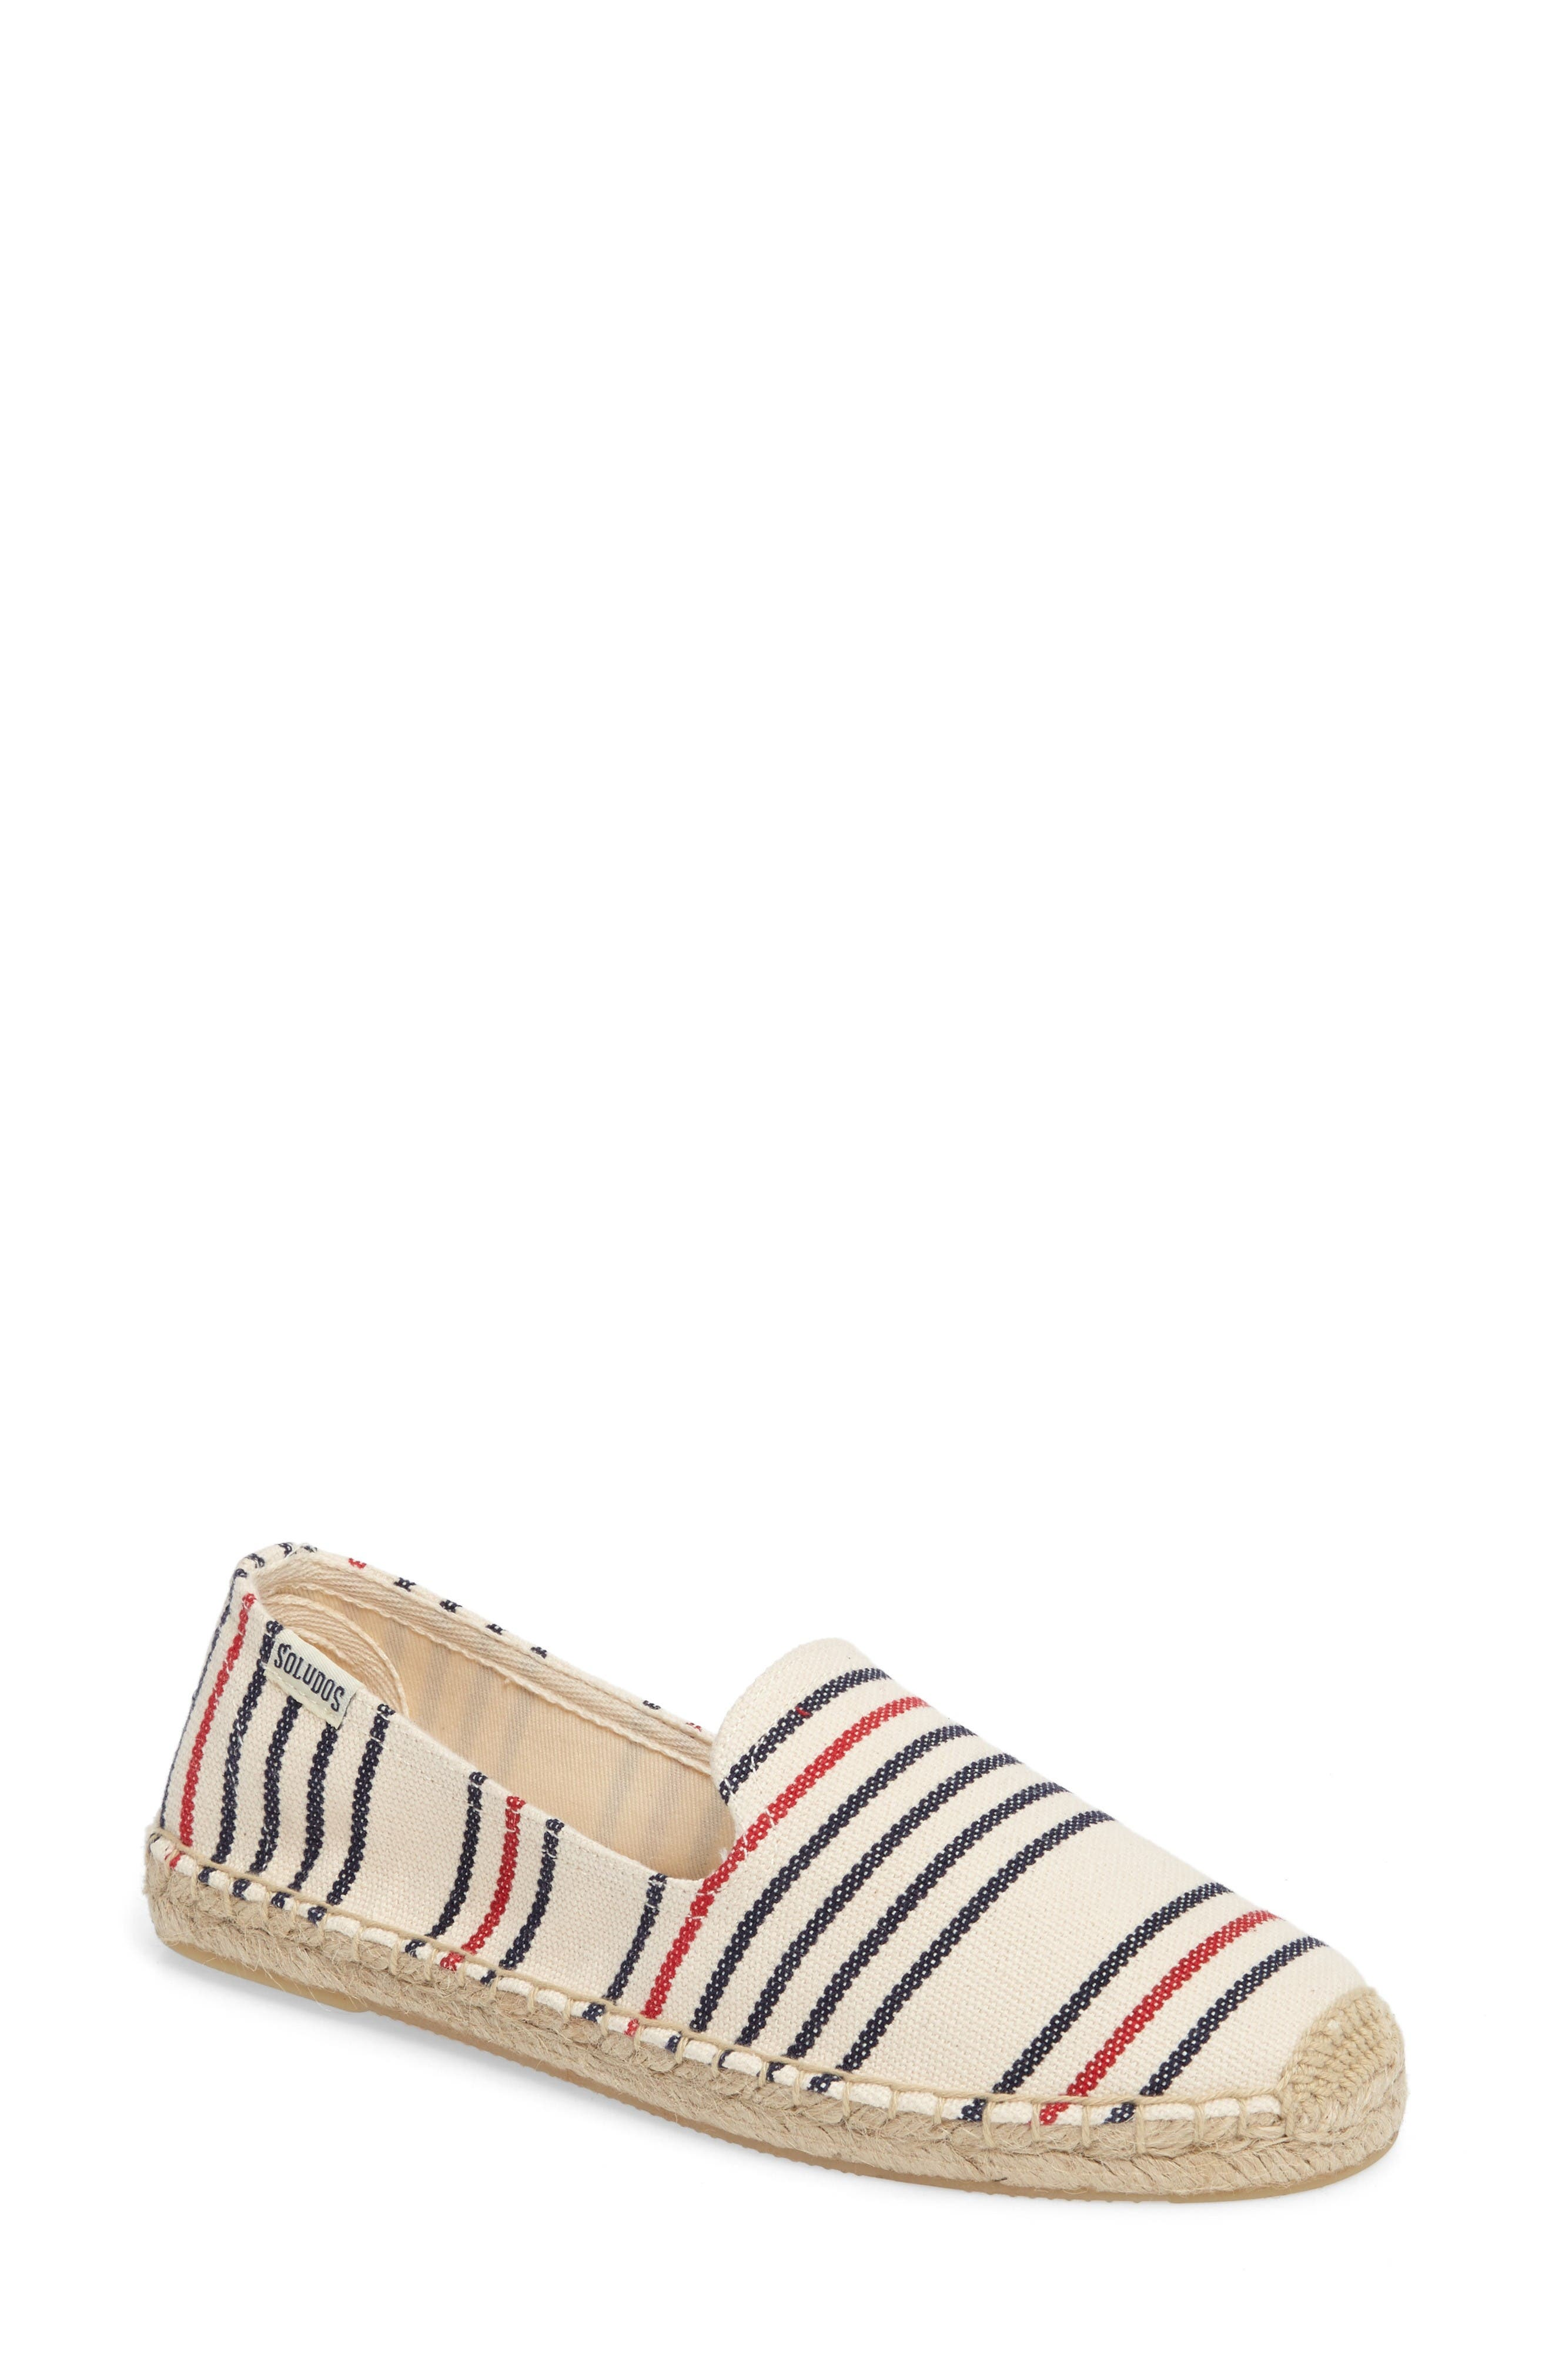 Alternate Image 1 Selected - Soludos Stripe Espadrille Loafer (Women)